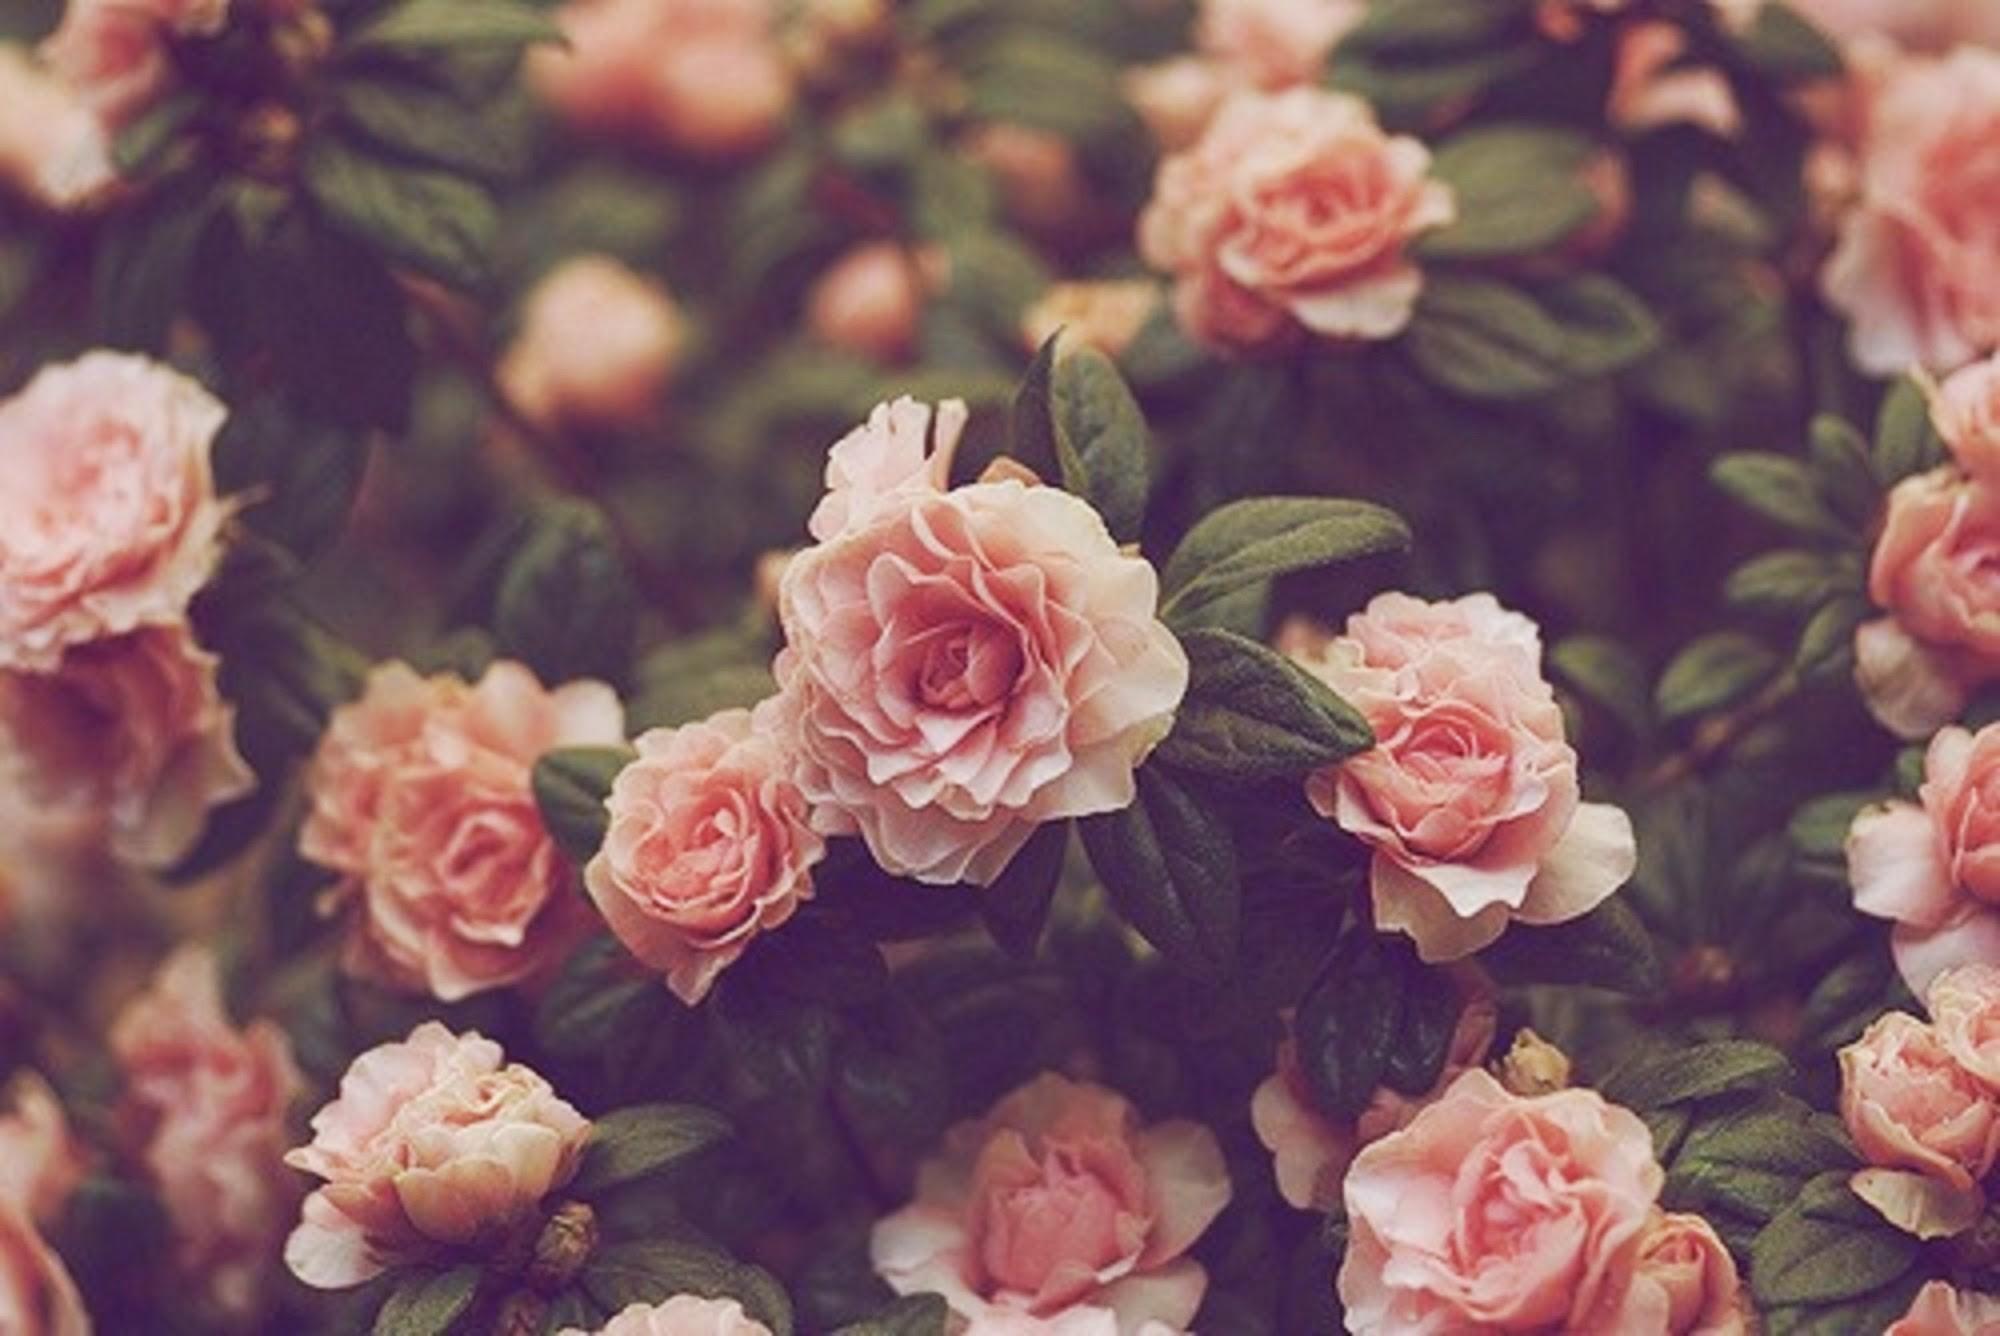 Vintage Flowers Wallpaper 68 Pictures